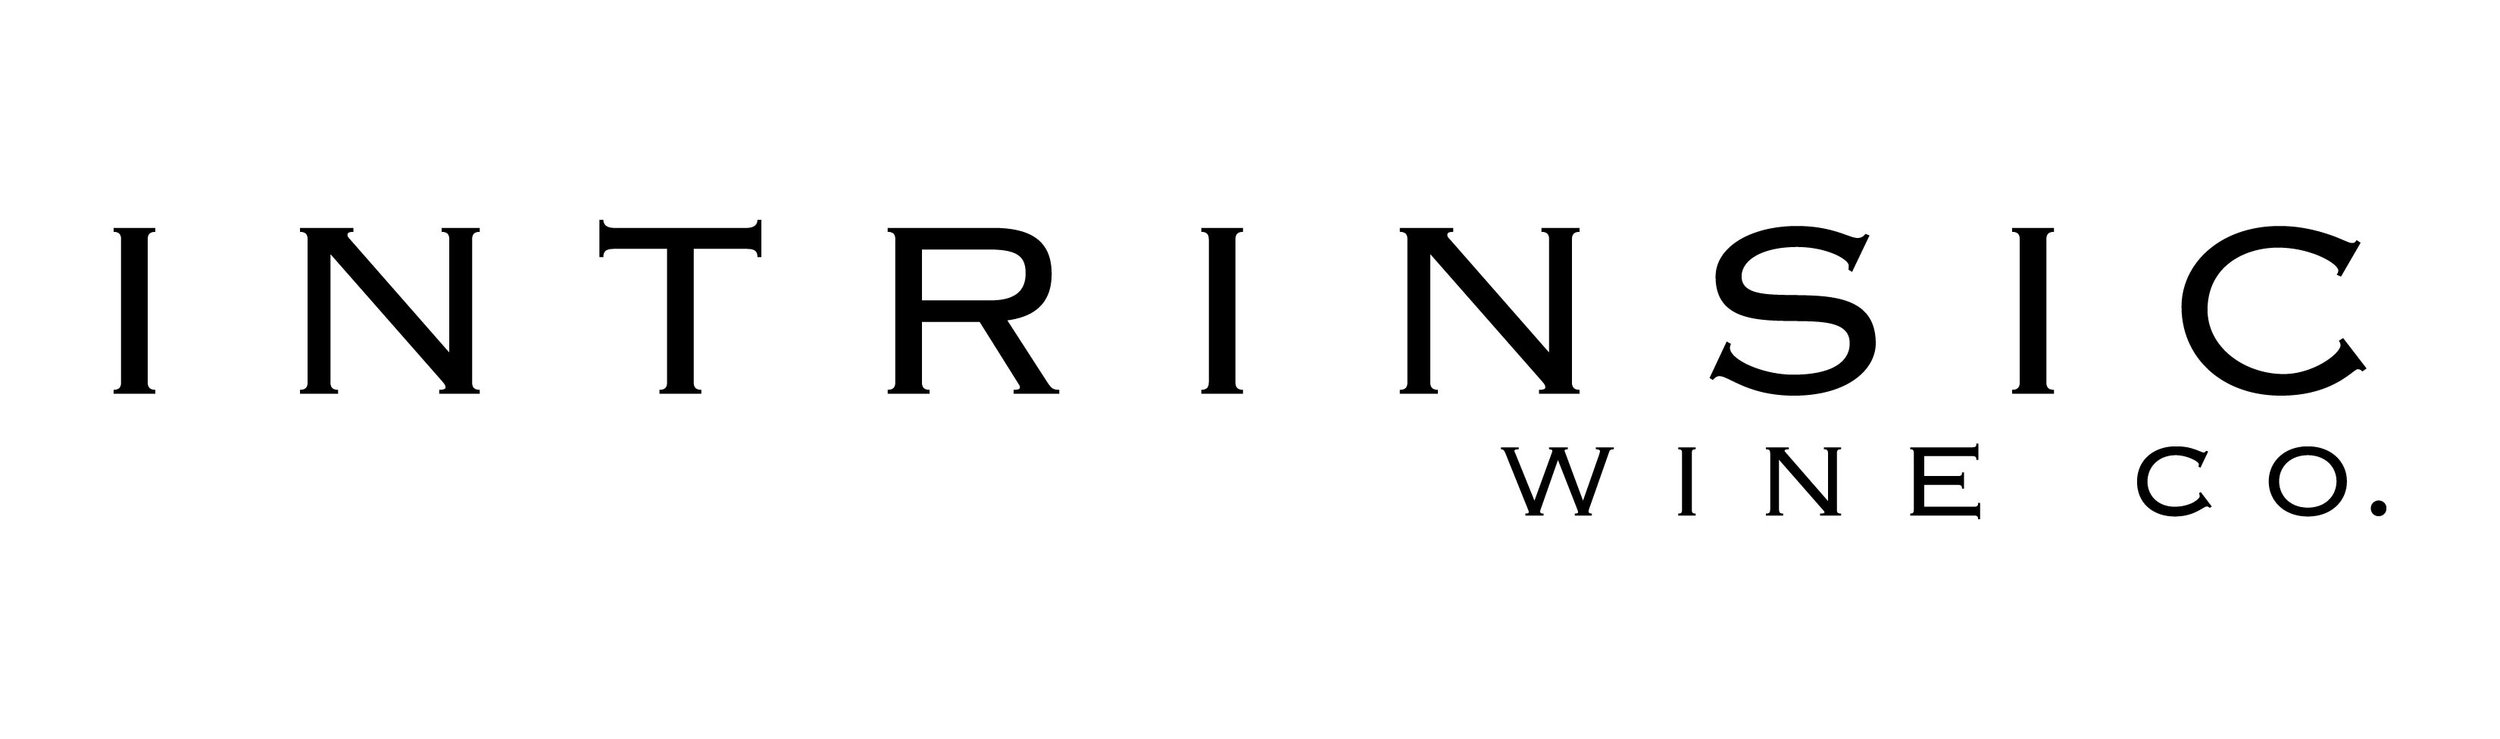 ITS_Logo_WineCo_Black (1).jpg